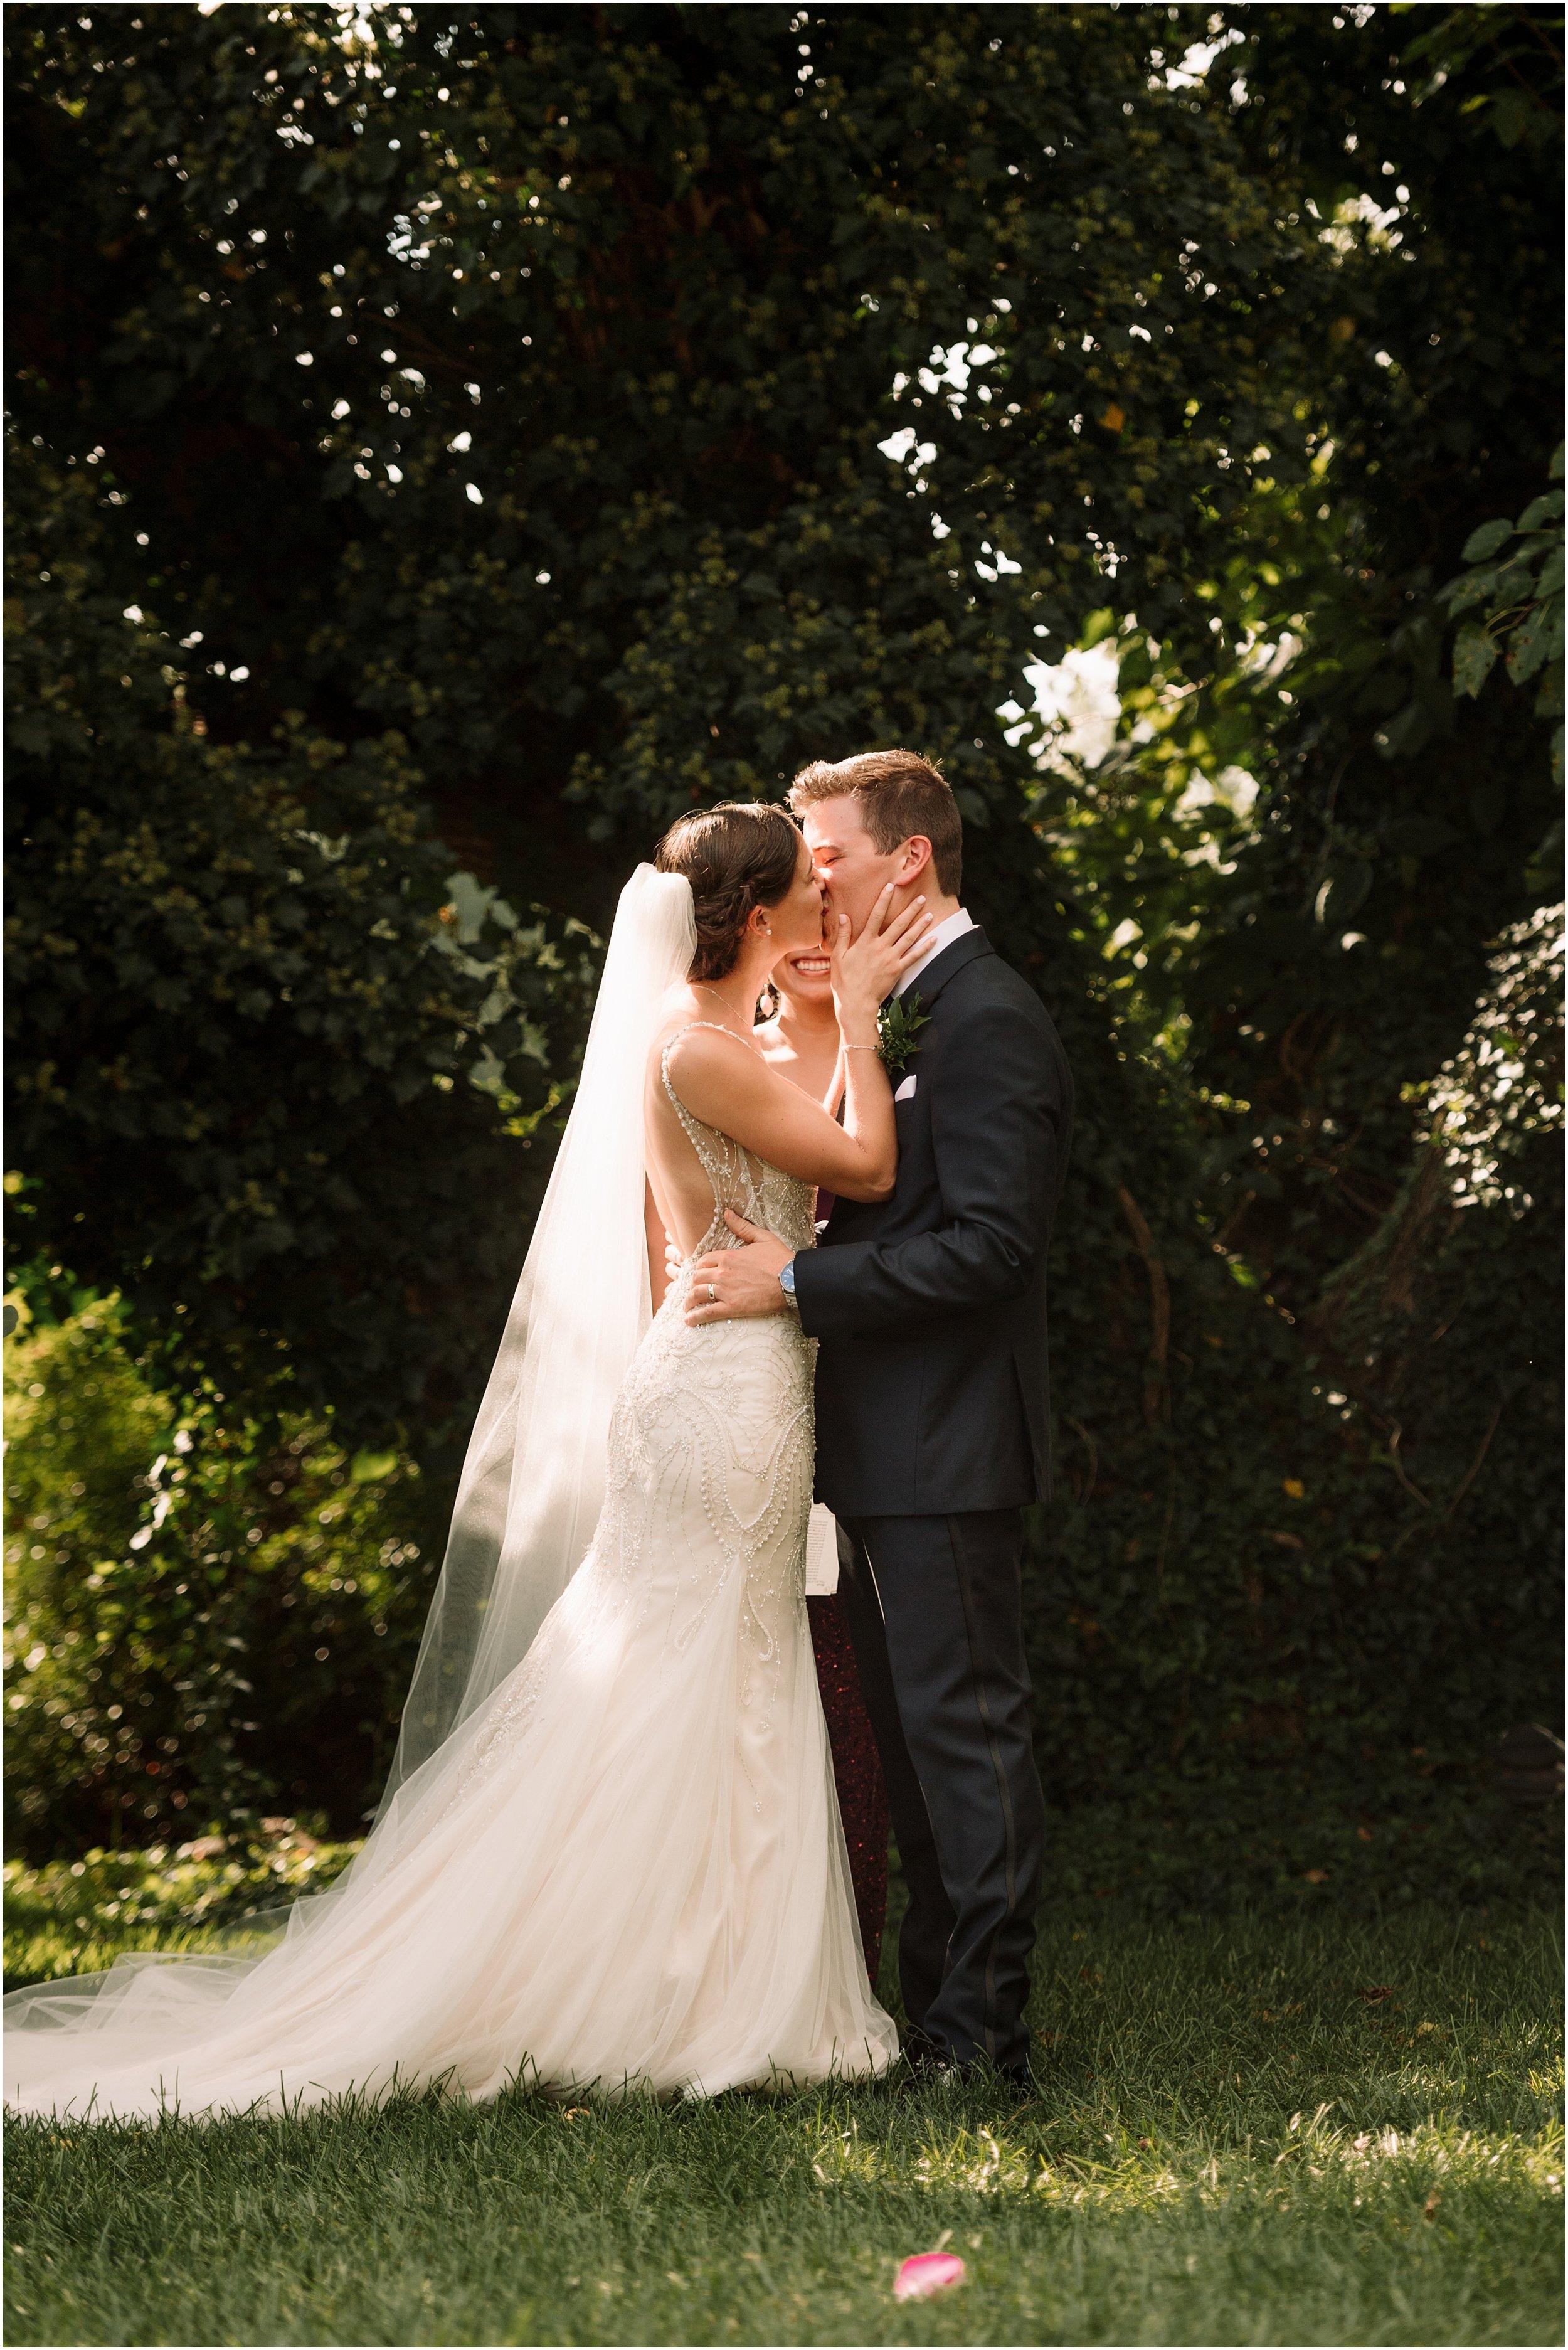 hannah leigh photography Antrim 1844 Wedding_1219.jpg